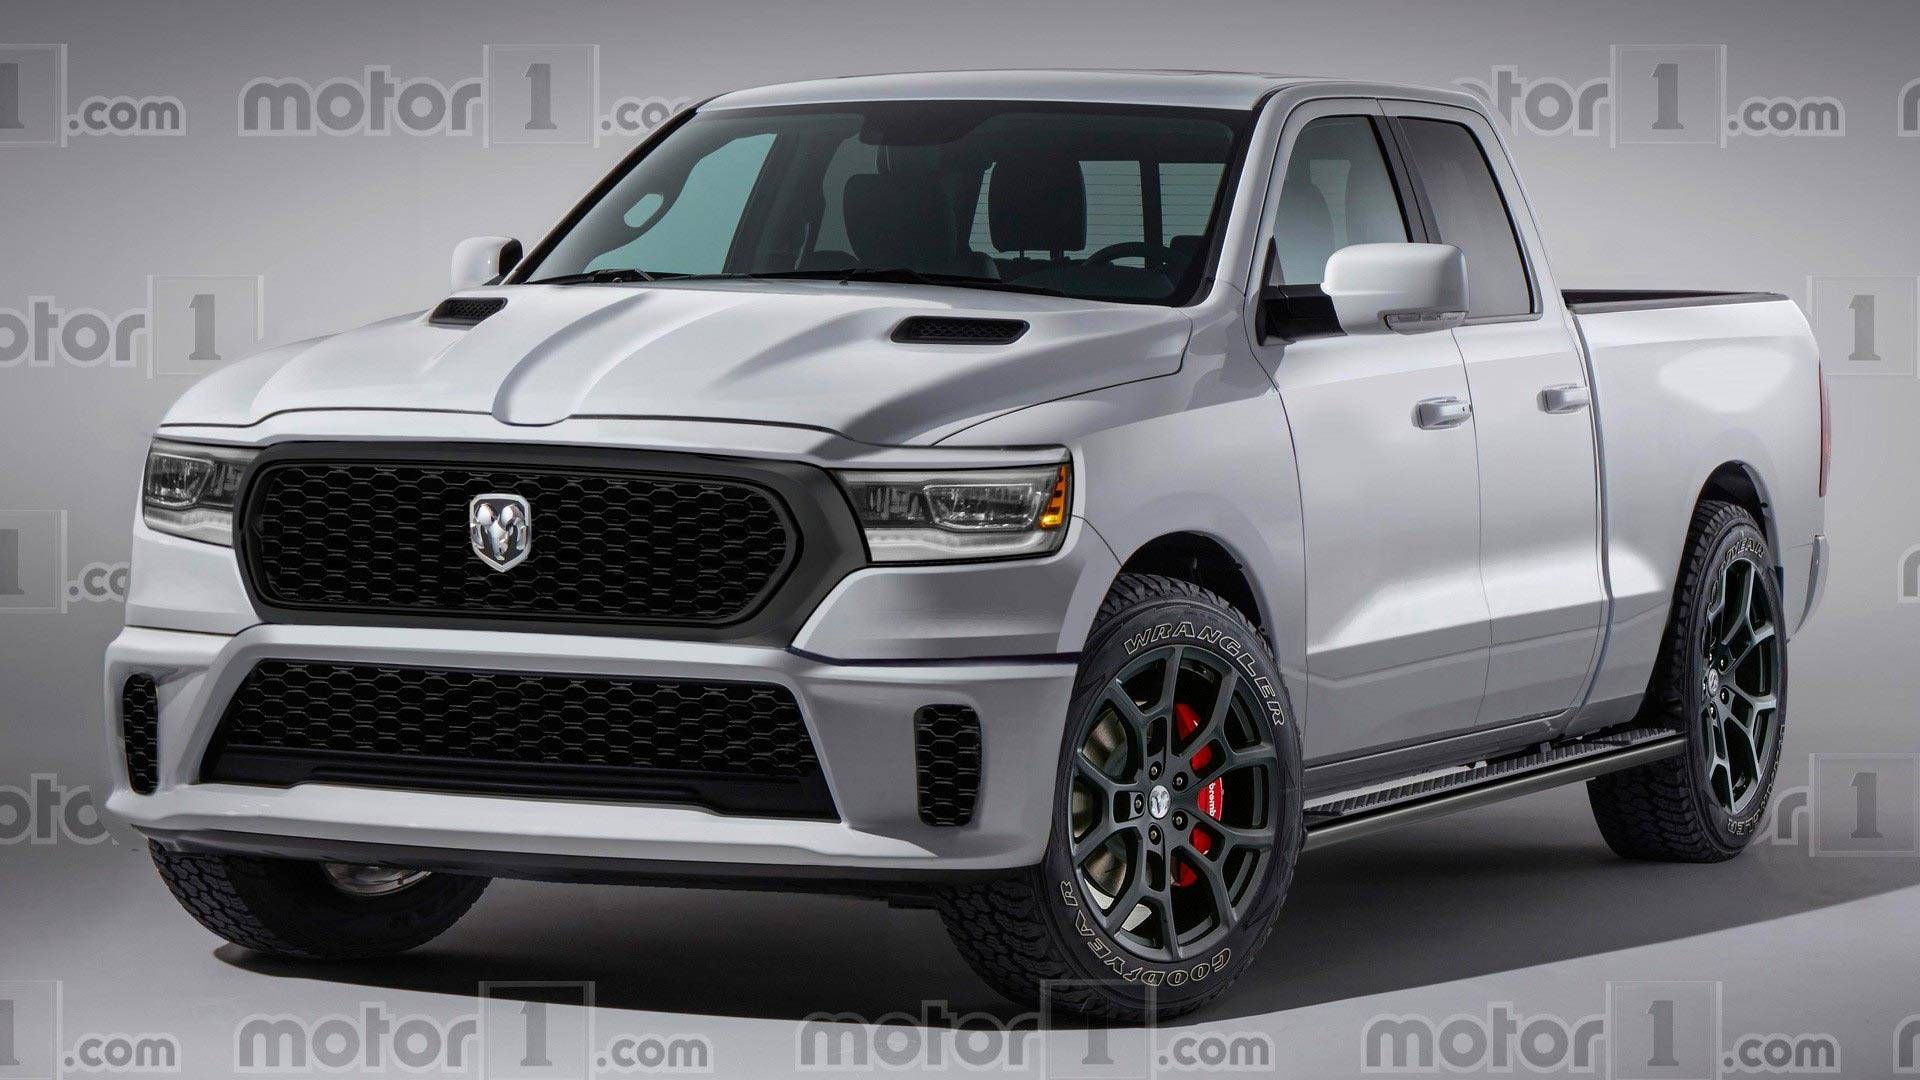 2020 Ram 1500 Hellcat Diesel Spesification